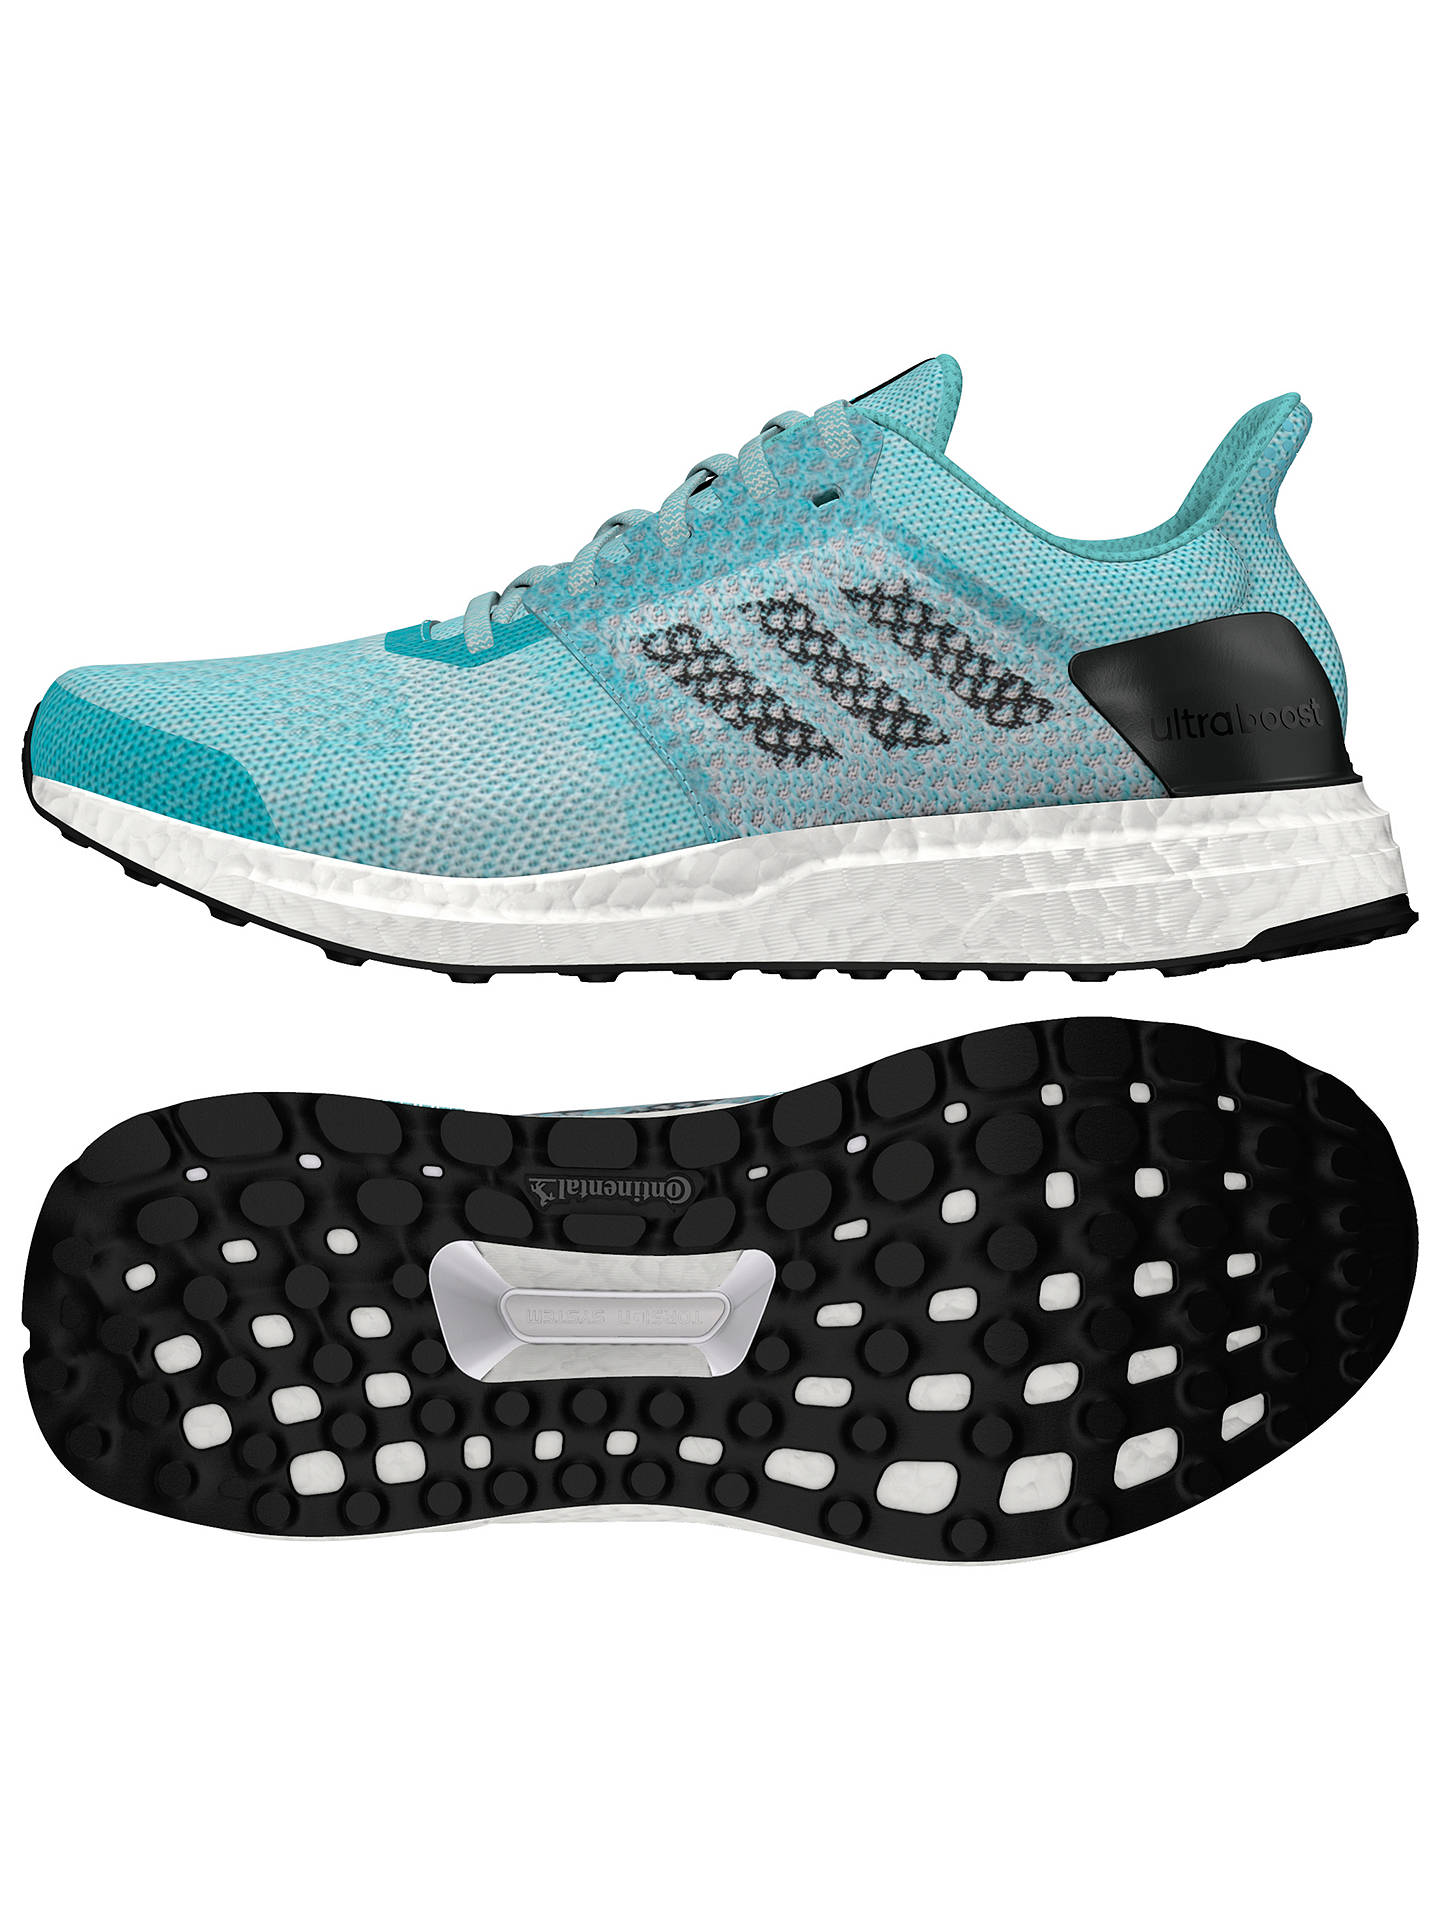 a8b8cd4001dfb ... Buy adidas UltraBOOST ST Women s Running Shoes